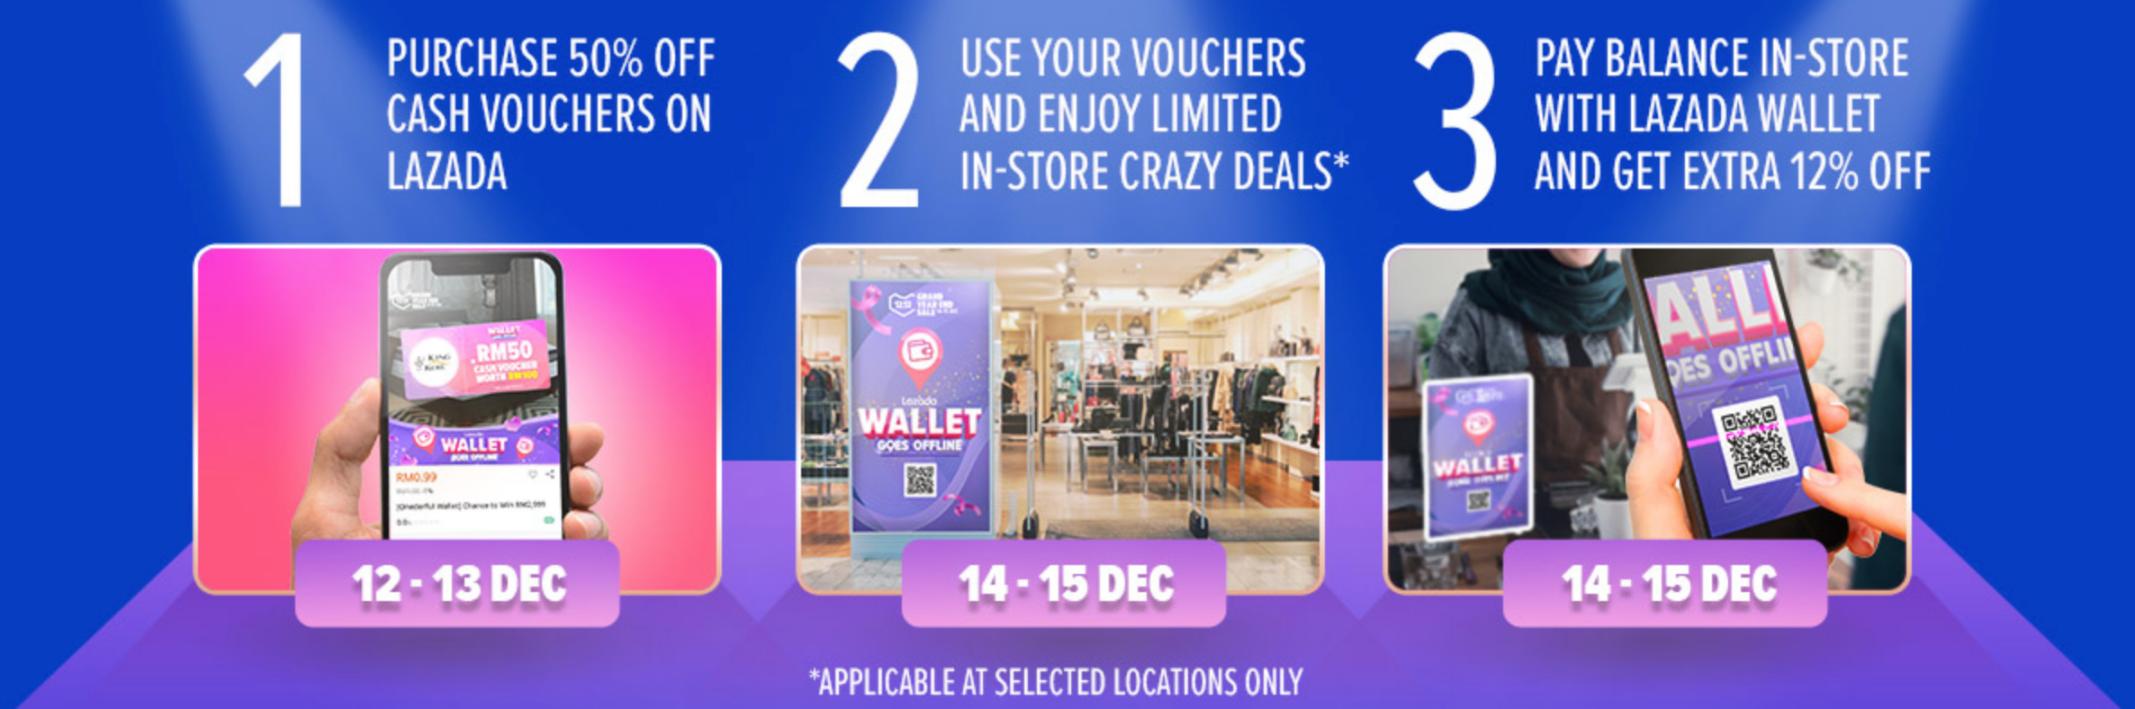 12-12-lazada-online-revolution-malaysia-lazada-wallet-goes-offline